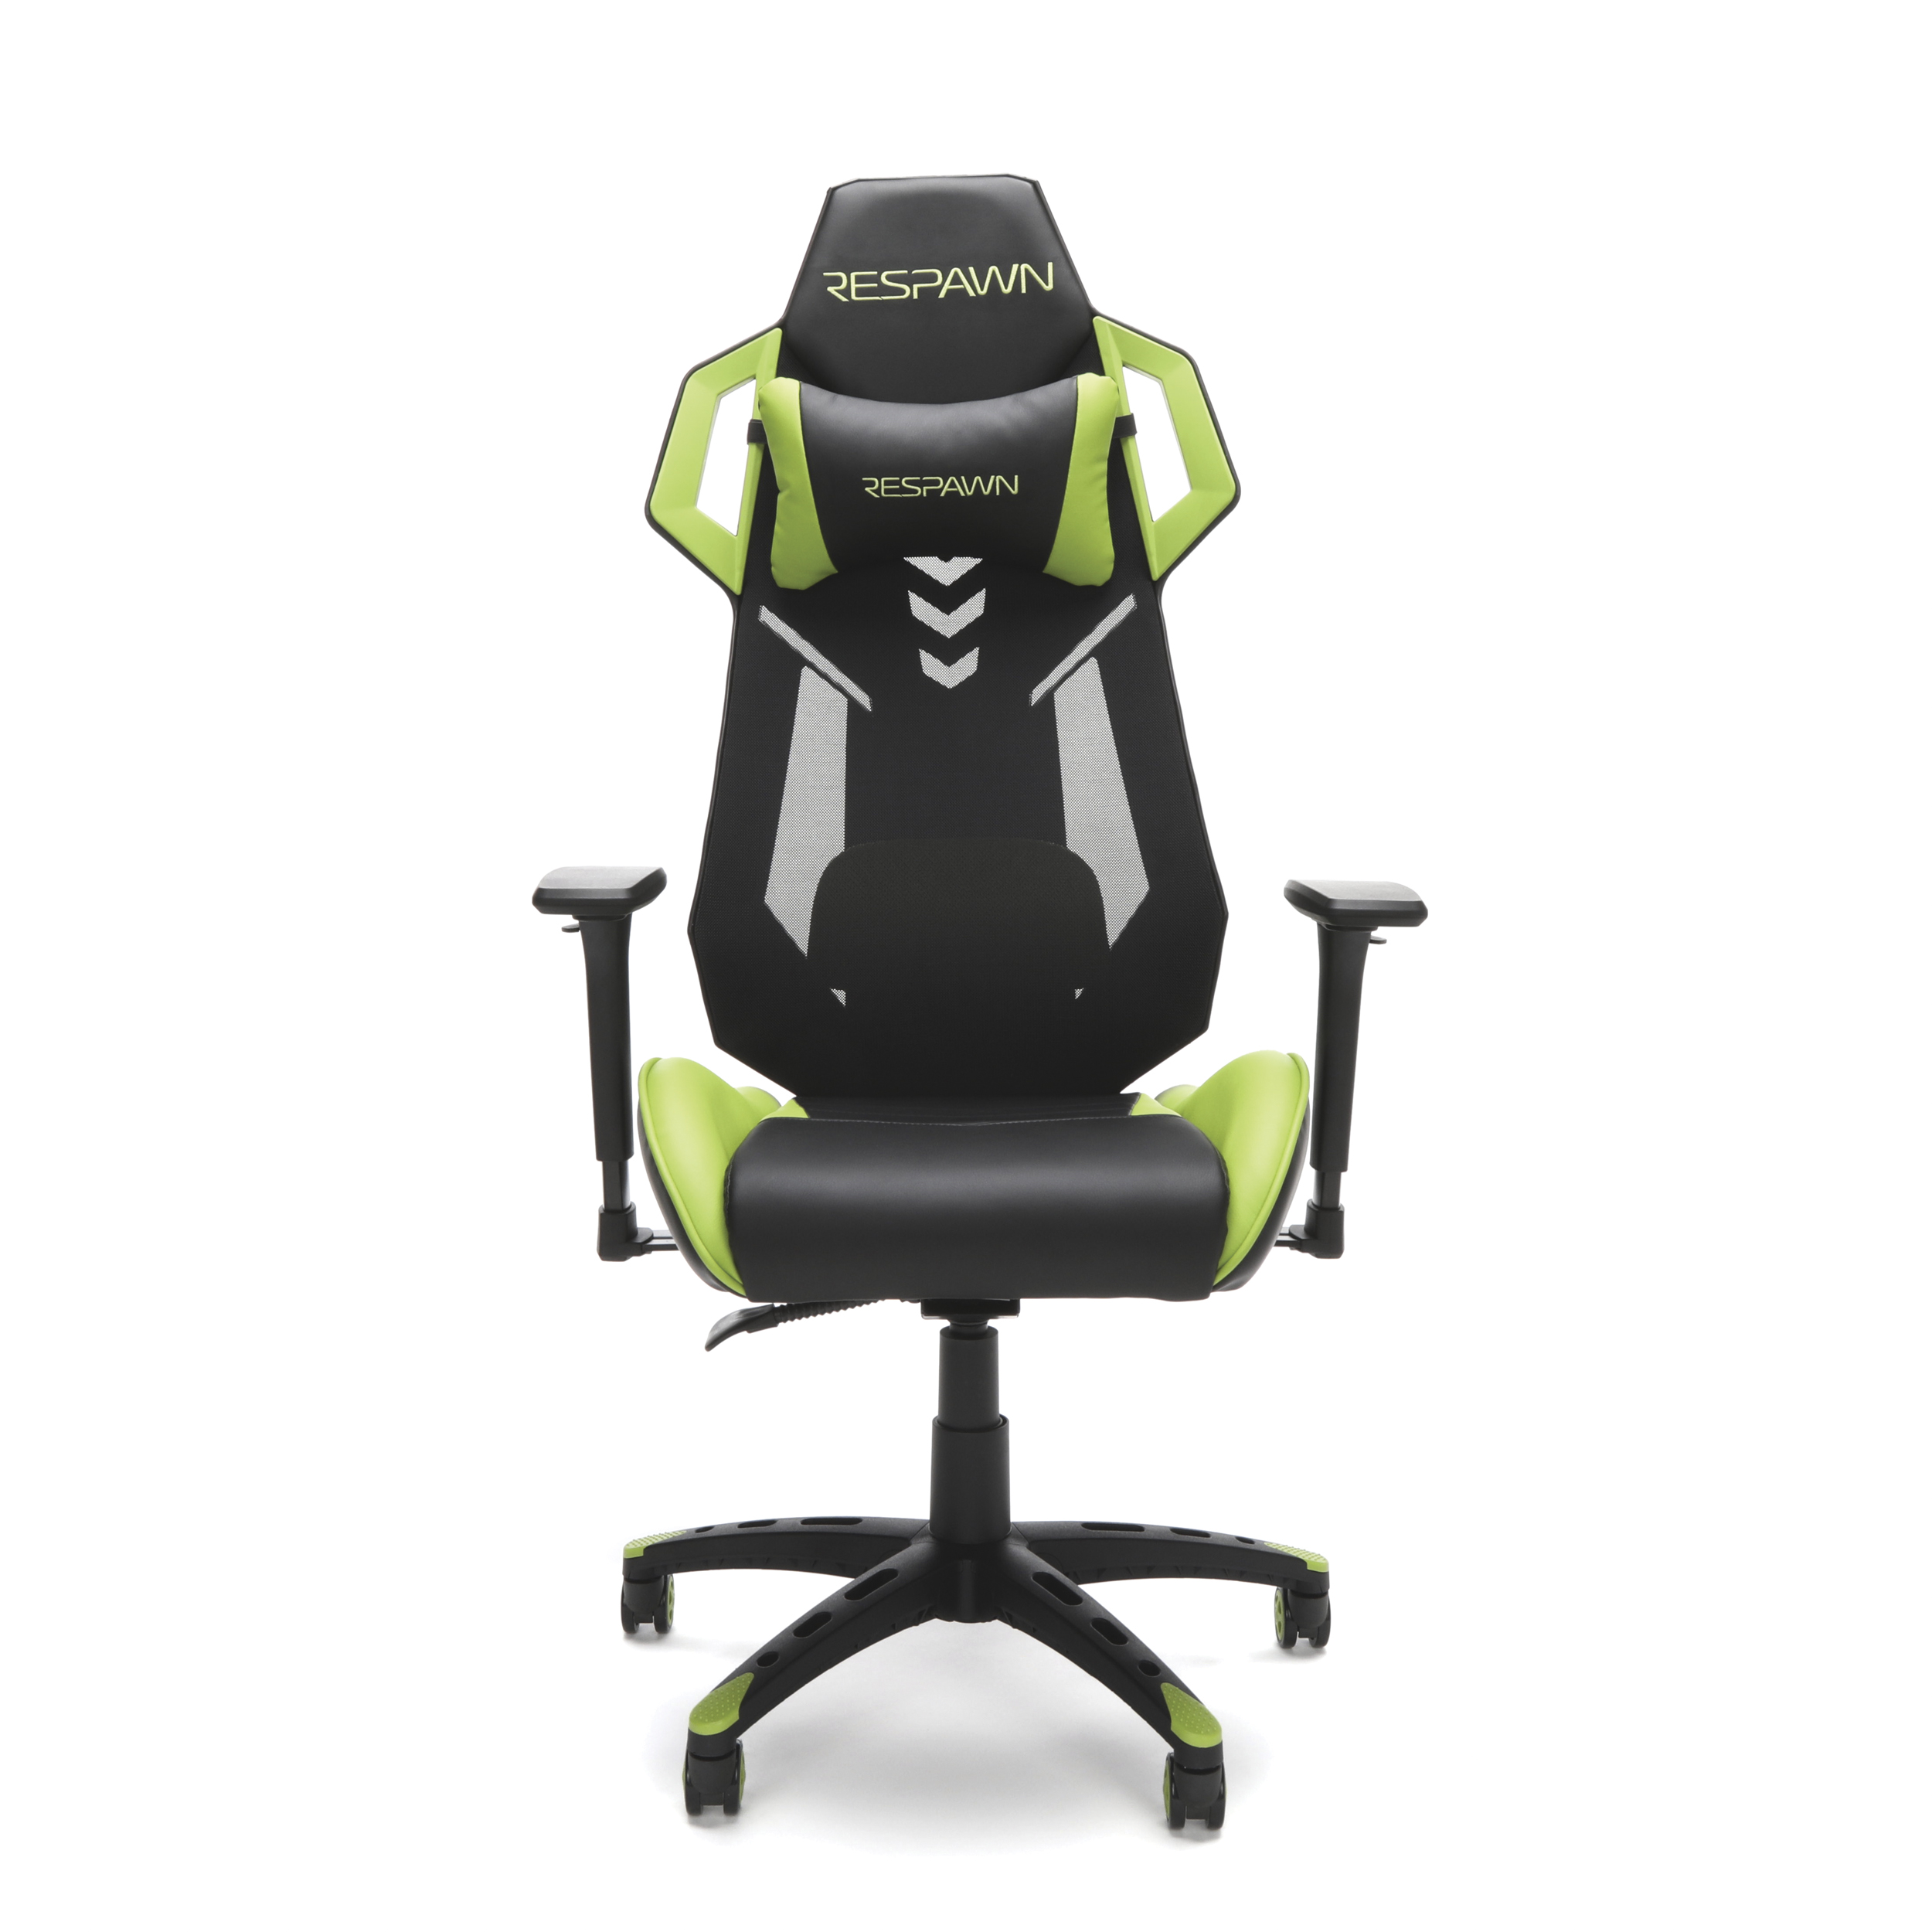 Strange Respawn 200 Racing Style Gaming Chair Ergonomic Evergreenethics Interior Chair Design Evergreenethicsorg